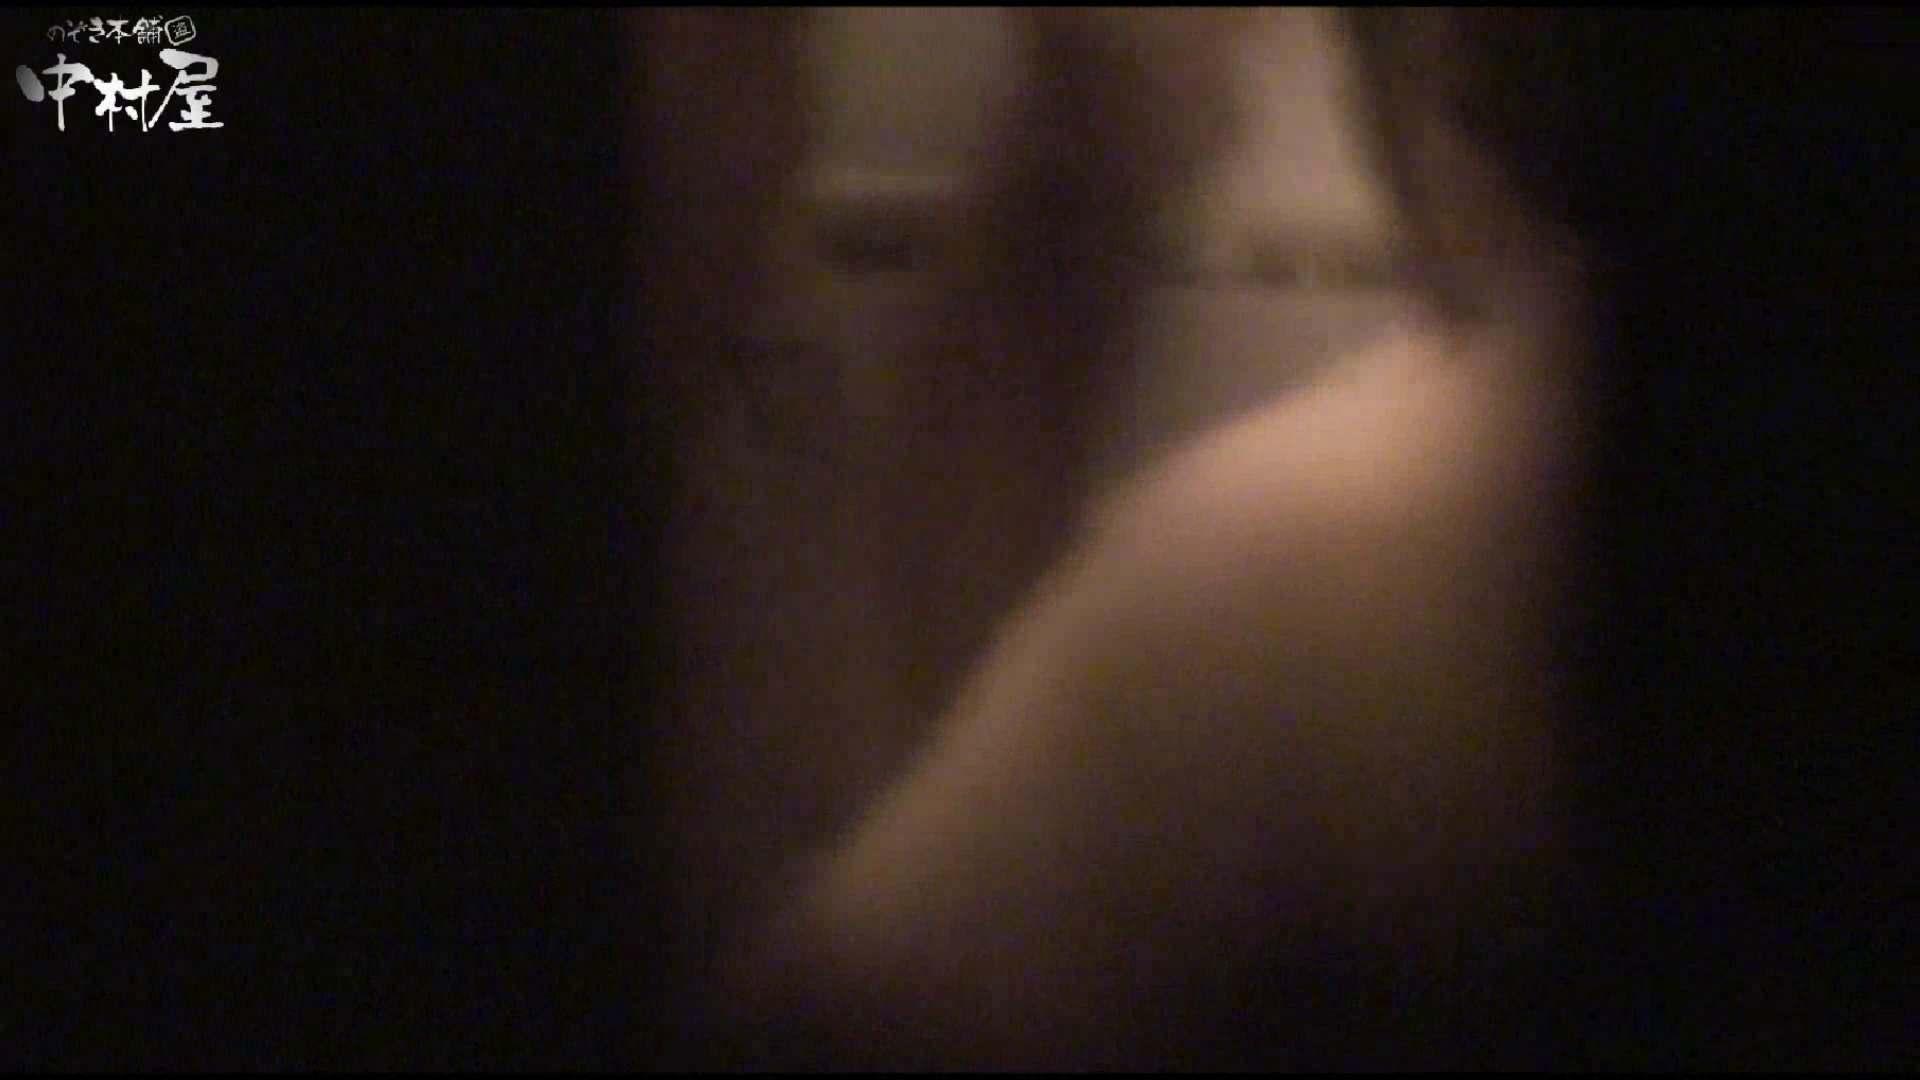 民家風呂専門盗撮師の超危険映像 vol.028 OLハメ撮り  28Pix 28